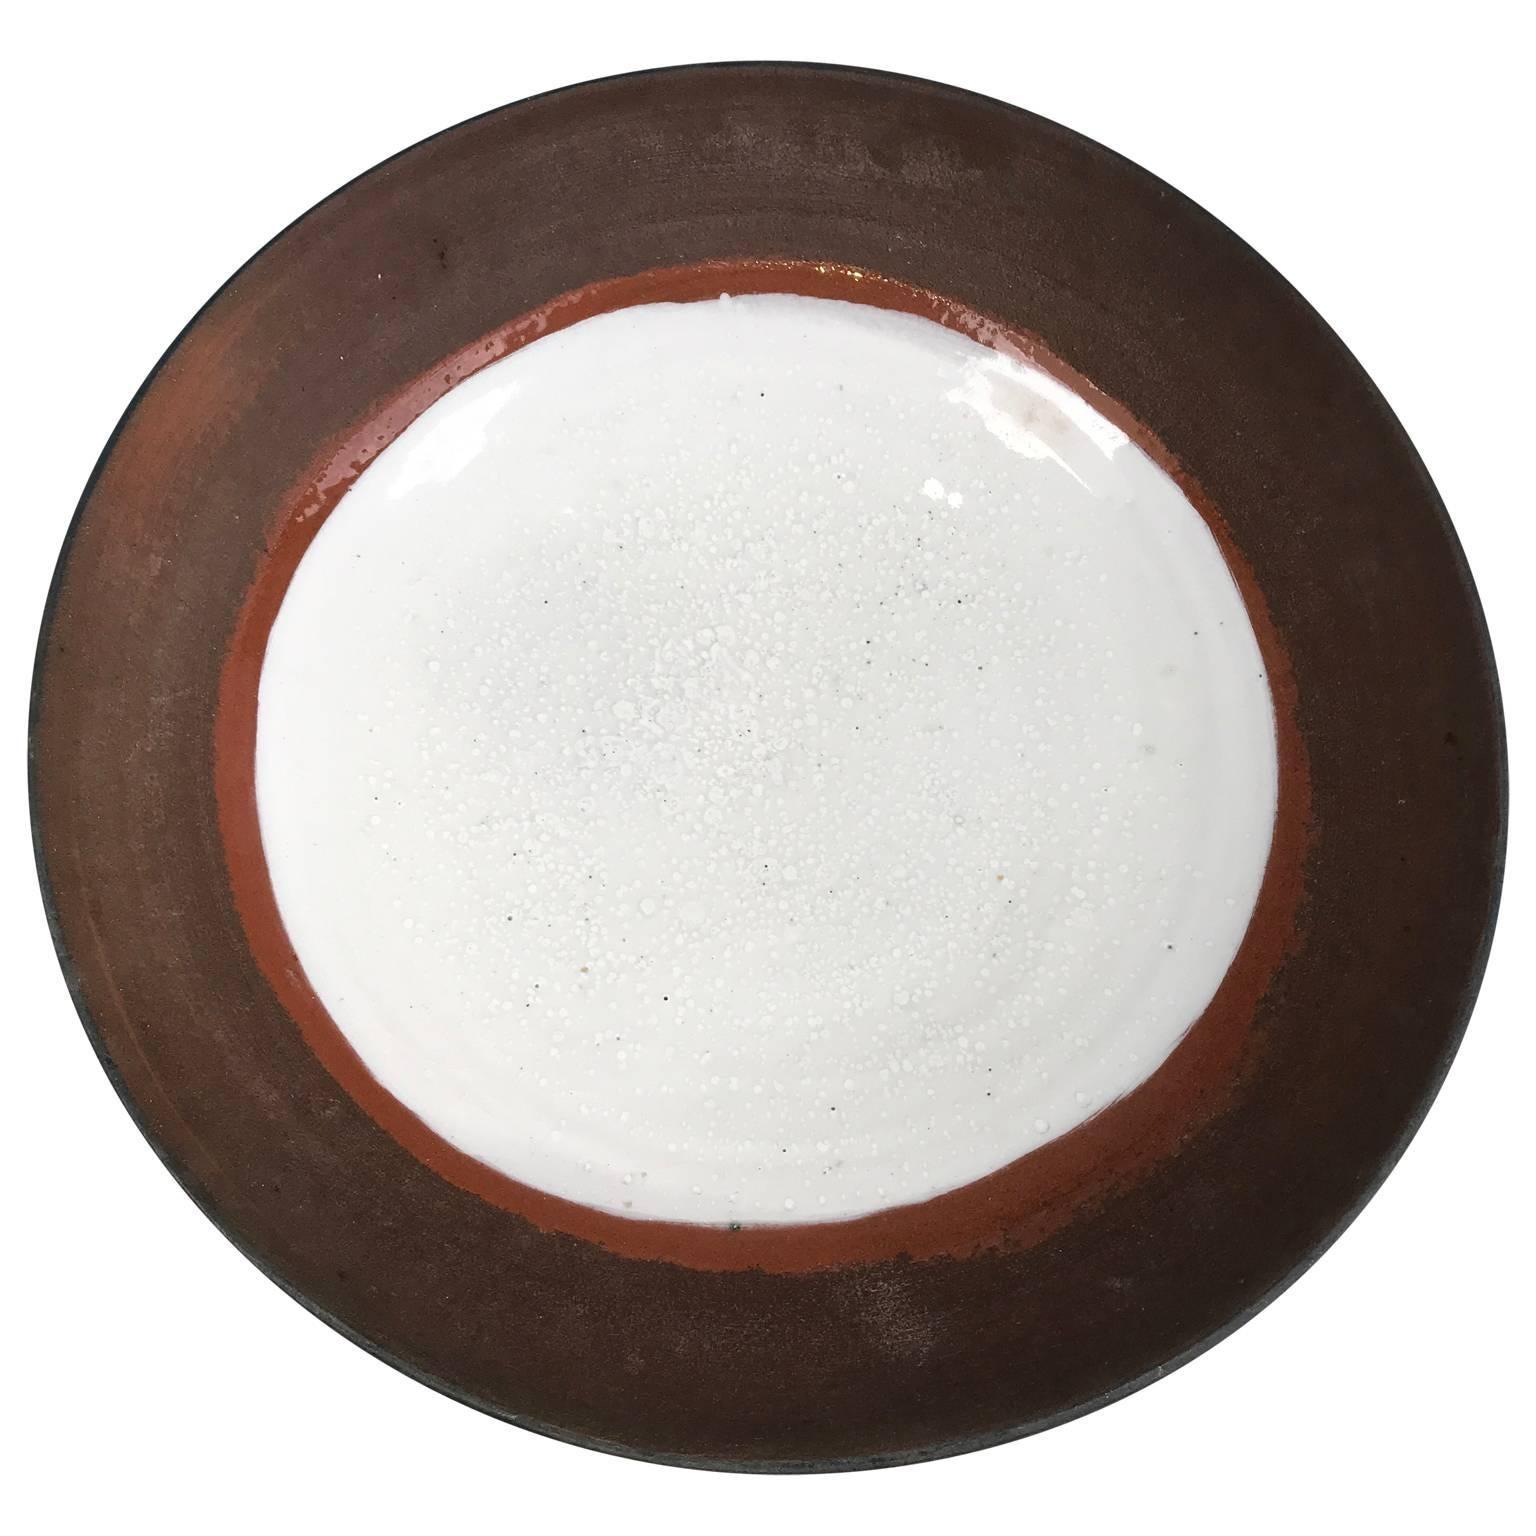 Large Mid-Century Modern Glazed Stoneware Chargere Plate  sc 1 st  1stDibs & Black Ceramic Plates - 94 For Sale on 1stdibs